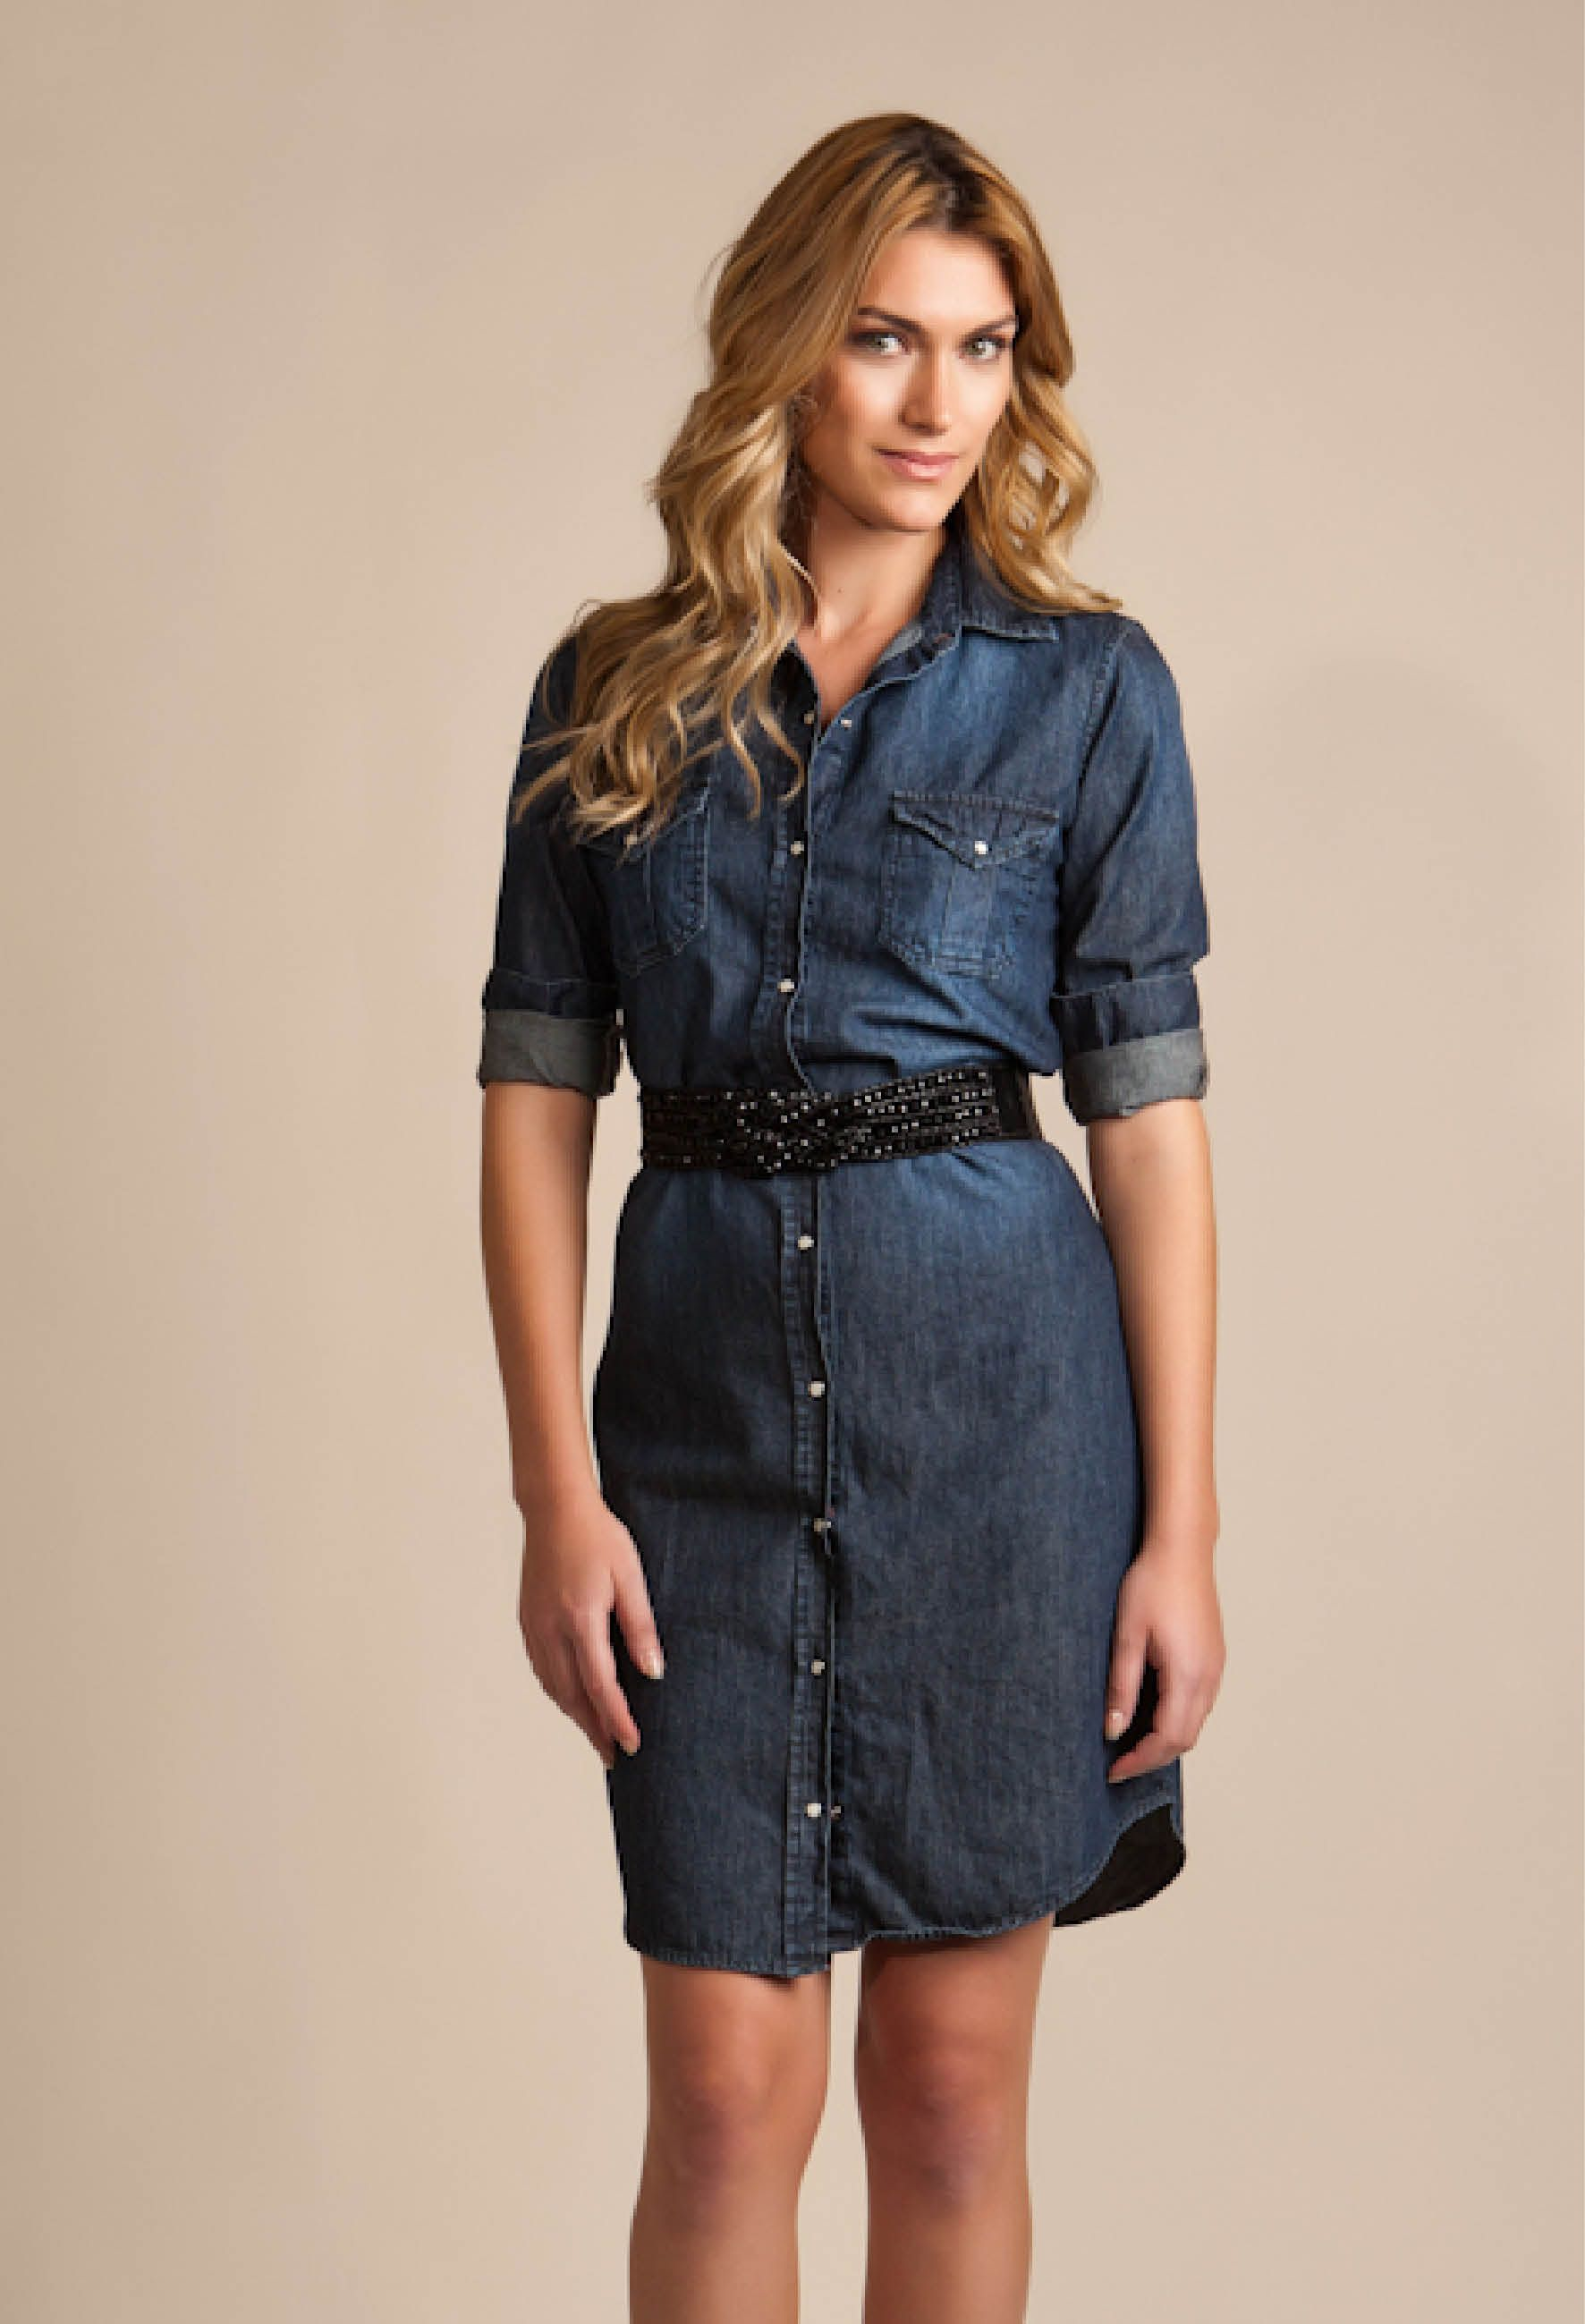 f9537163b25 jeans  dress  lookbook  winter  itsandco  style